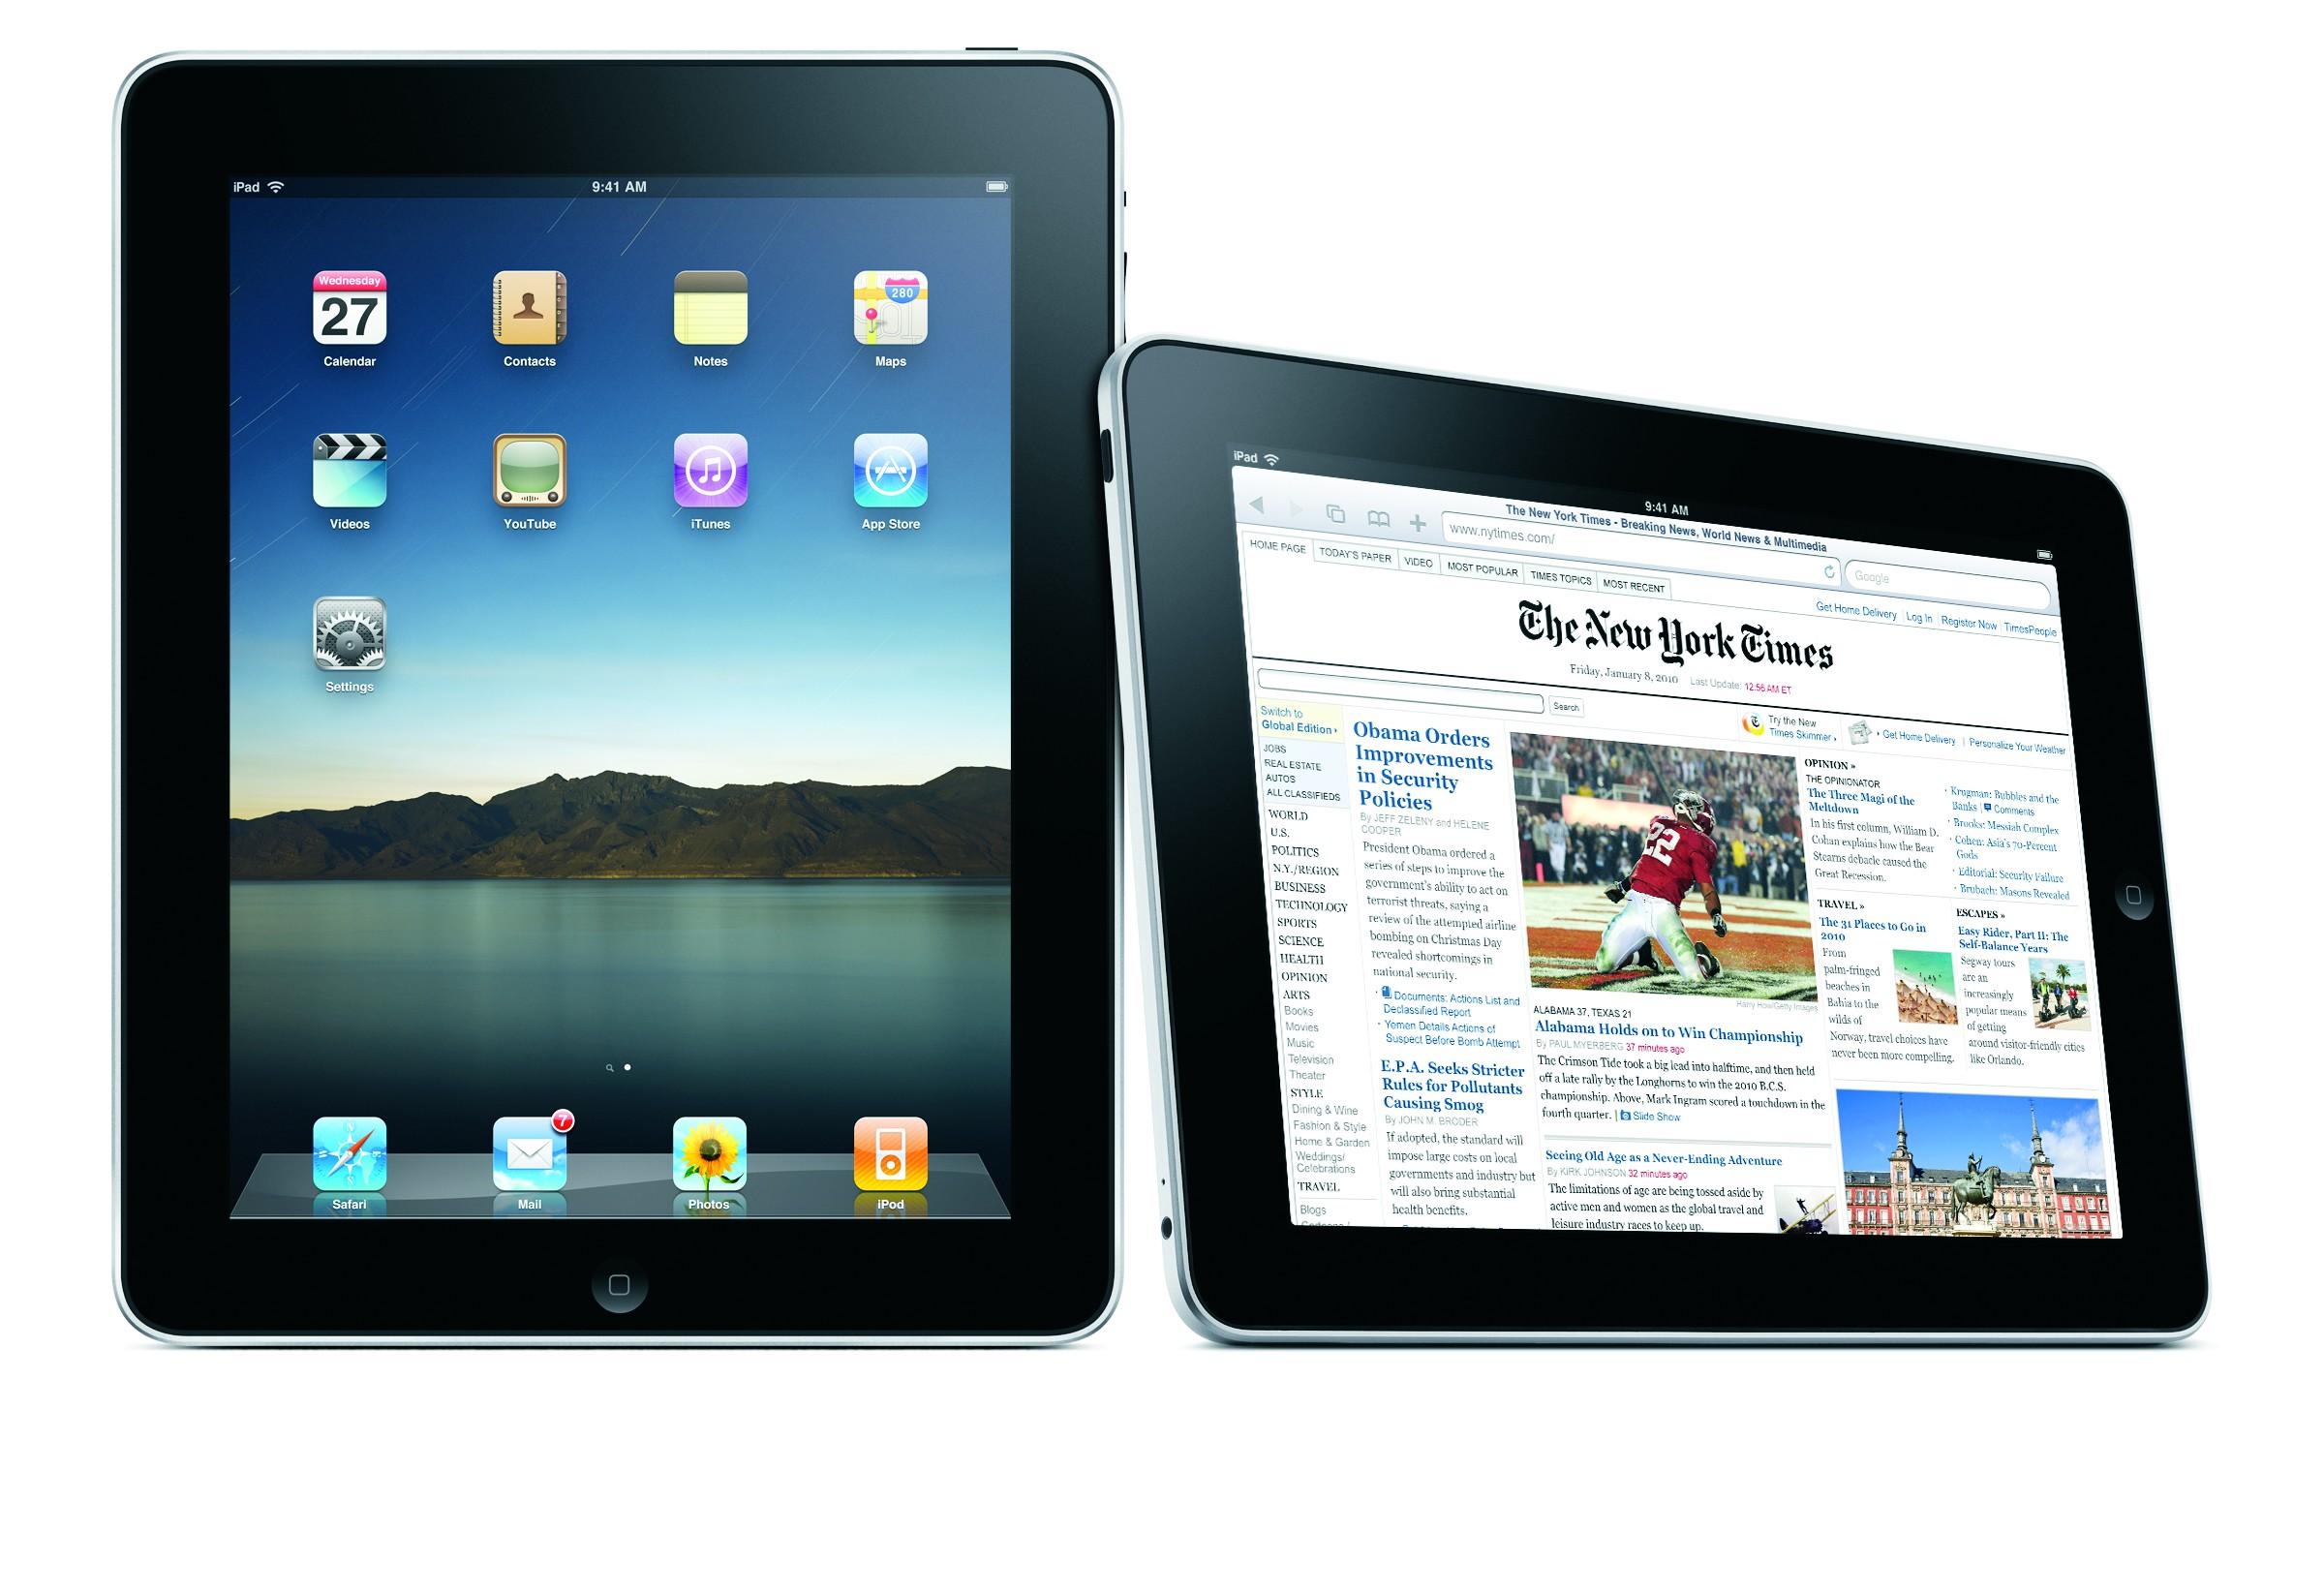 Niere wegen iPad verkauft: Organhändler jetzt hinter Gittern